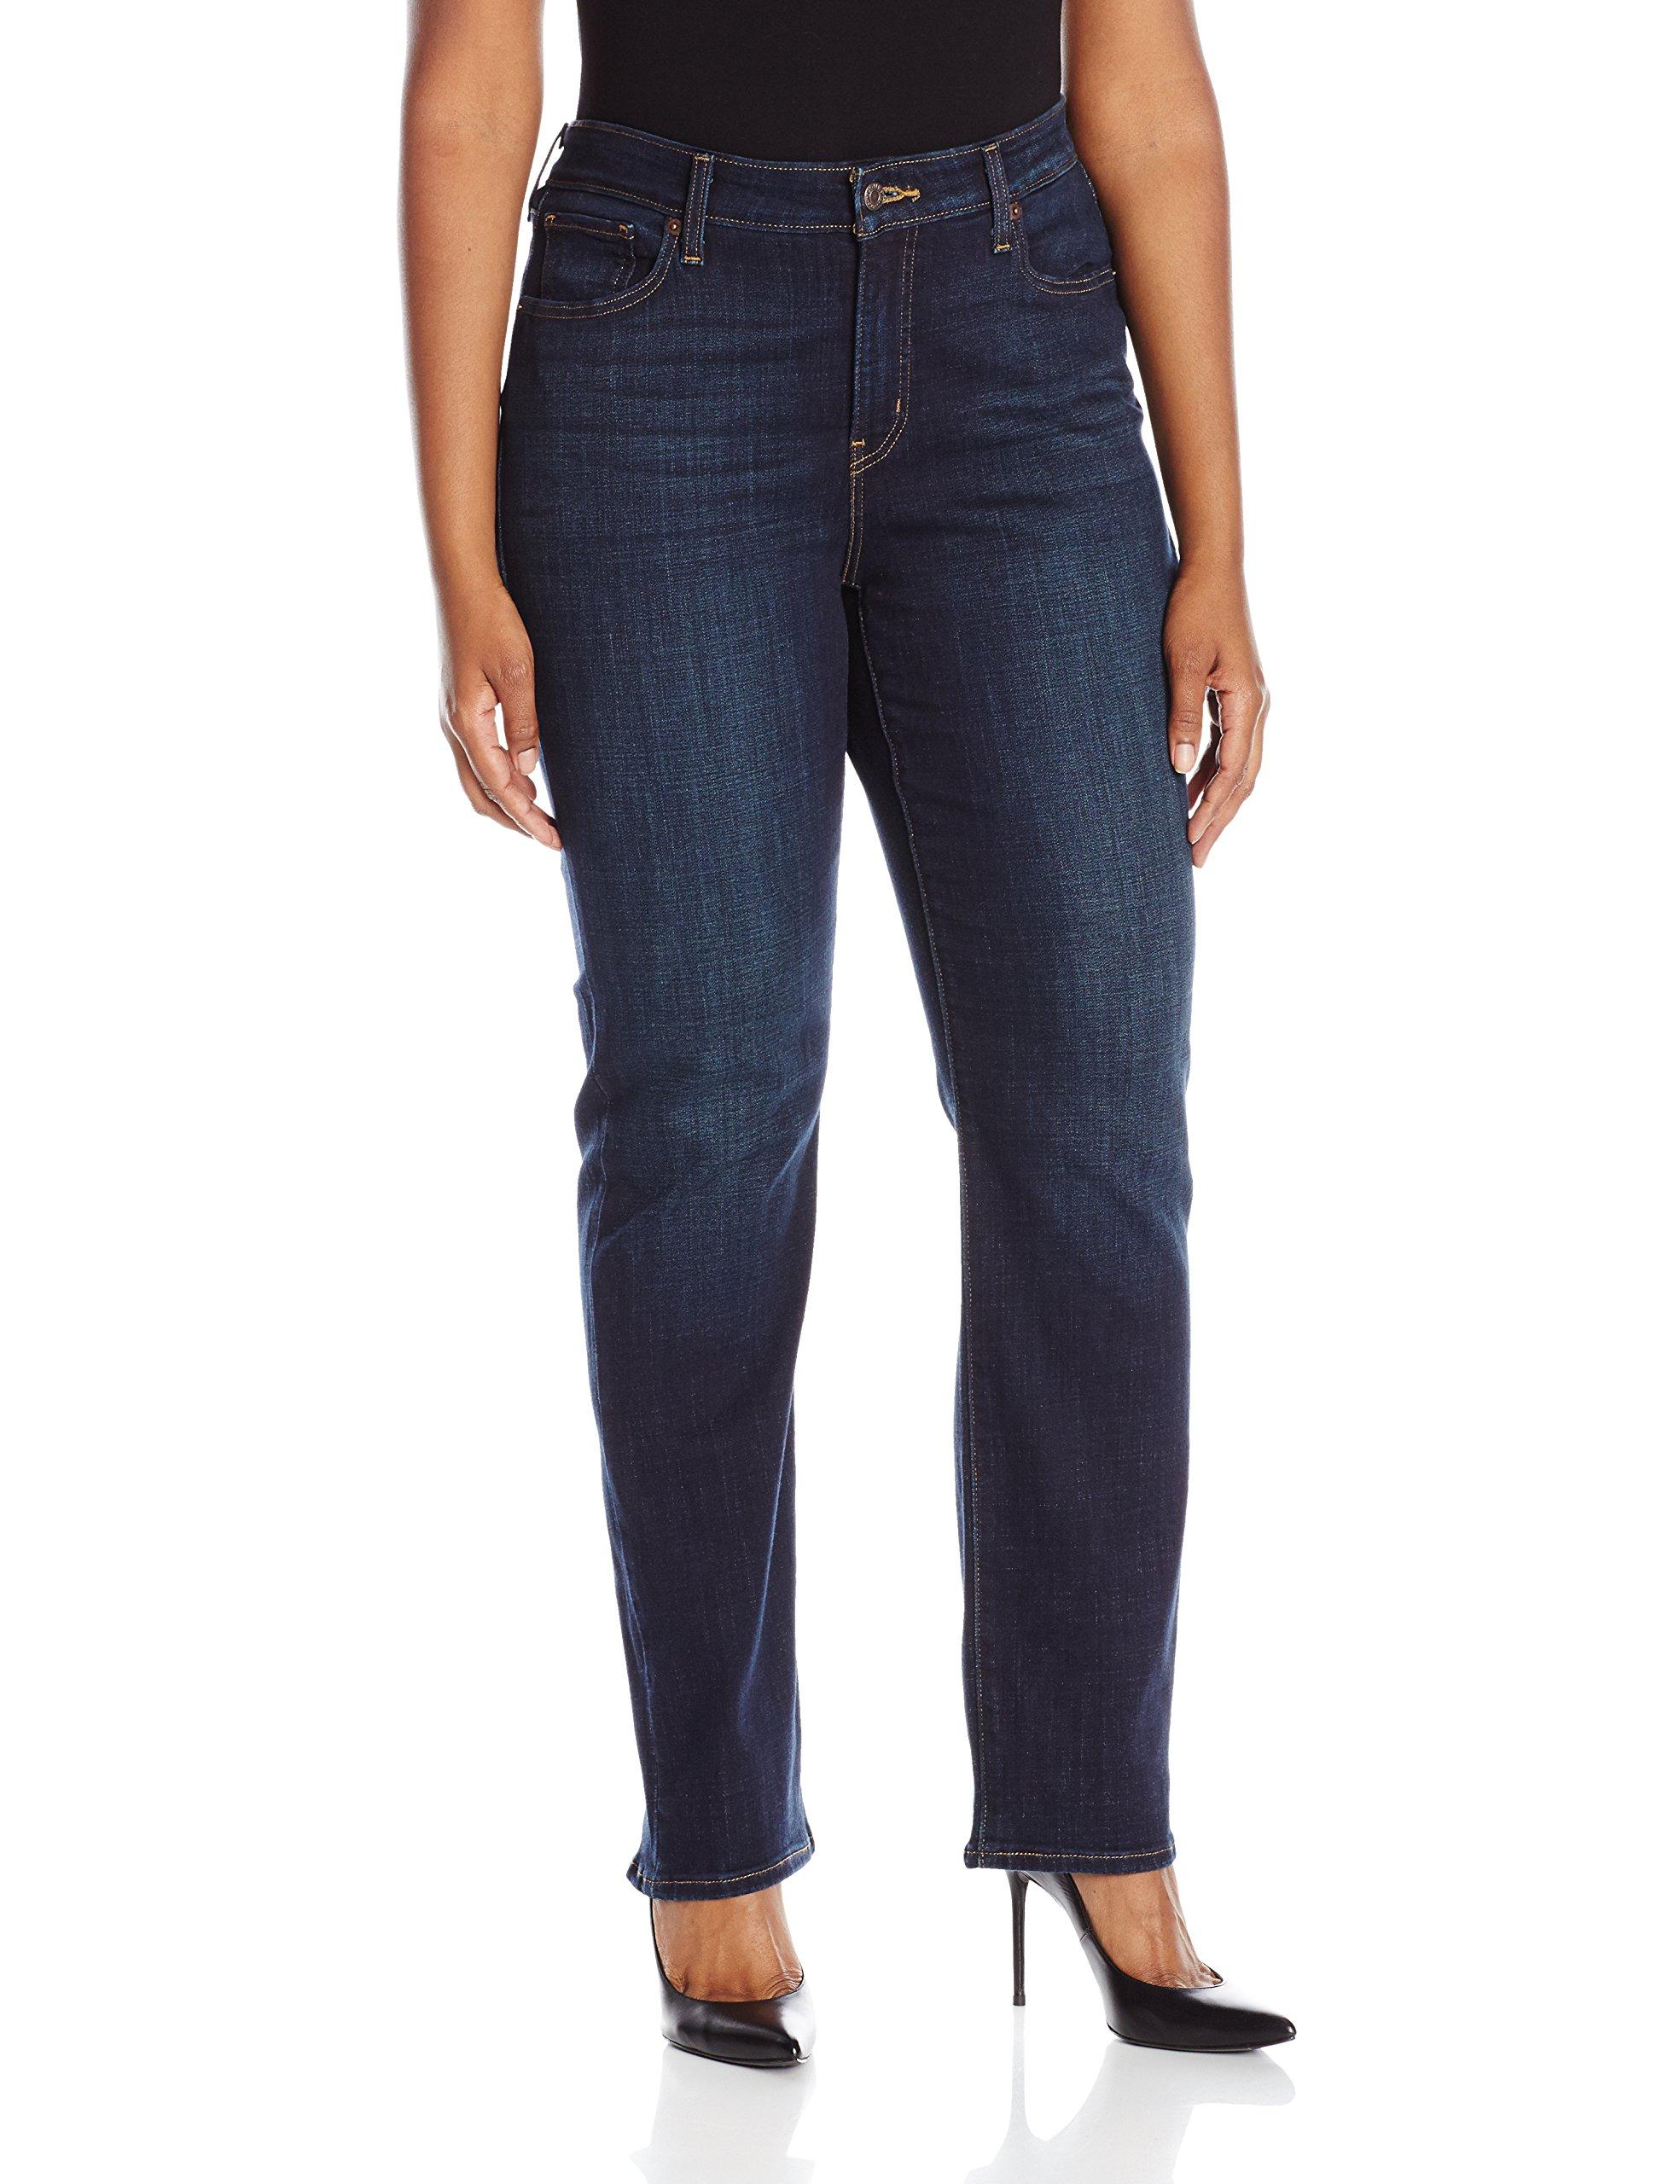 Levi's Women's Plus Size 414 Classic Straight Jean's, Thistle Lake, 38 (US 18) R